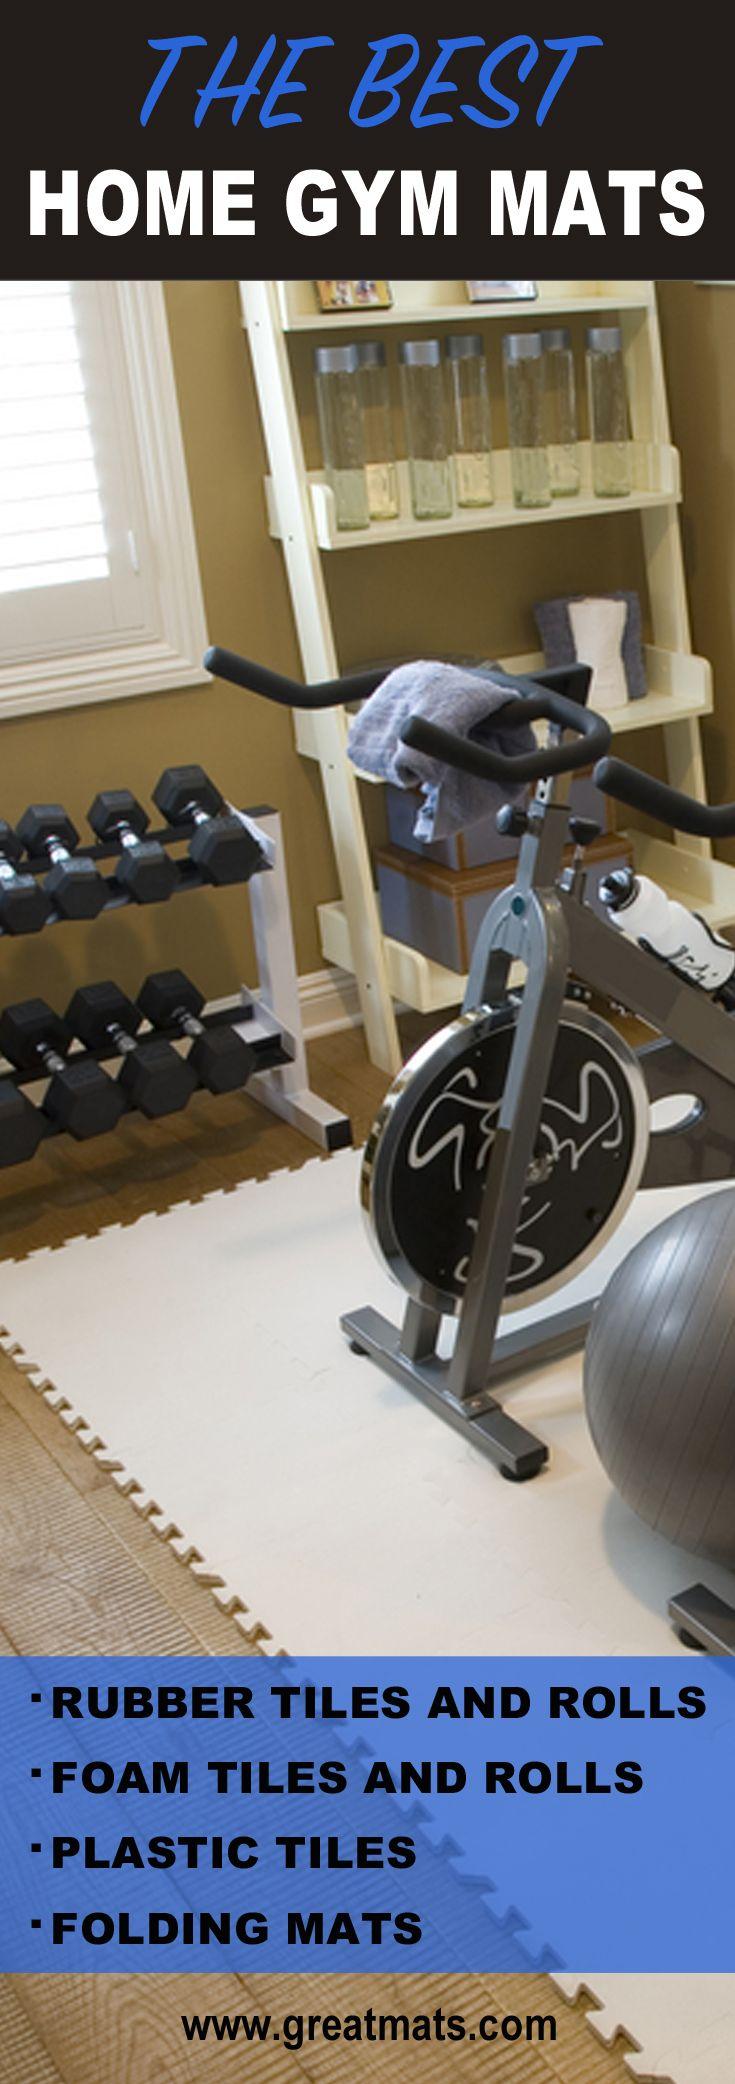 Rubber floor mats for garage gym - Find The Best Home Gym Mats At Greatmats Com